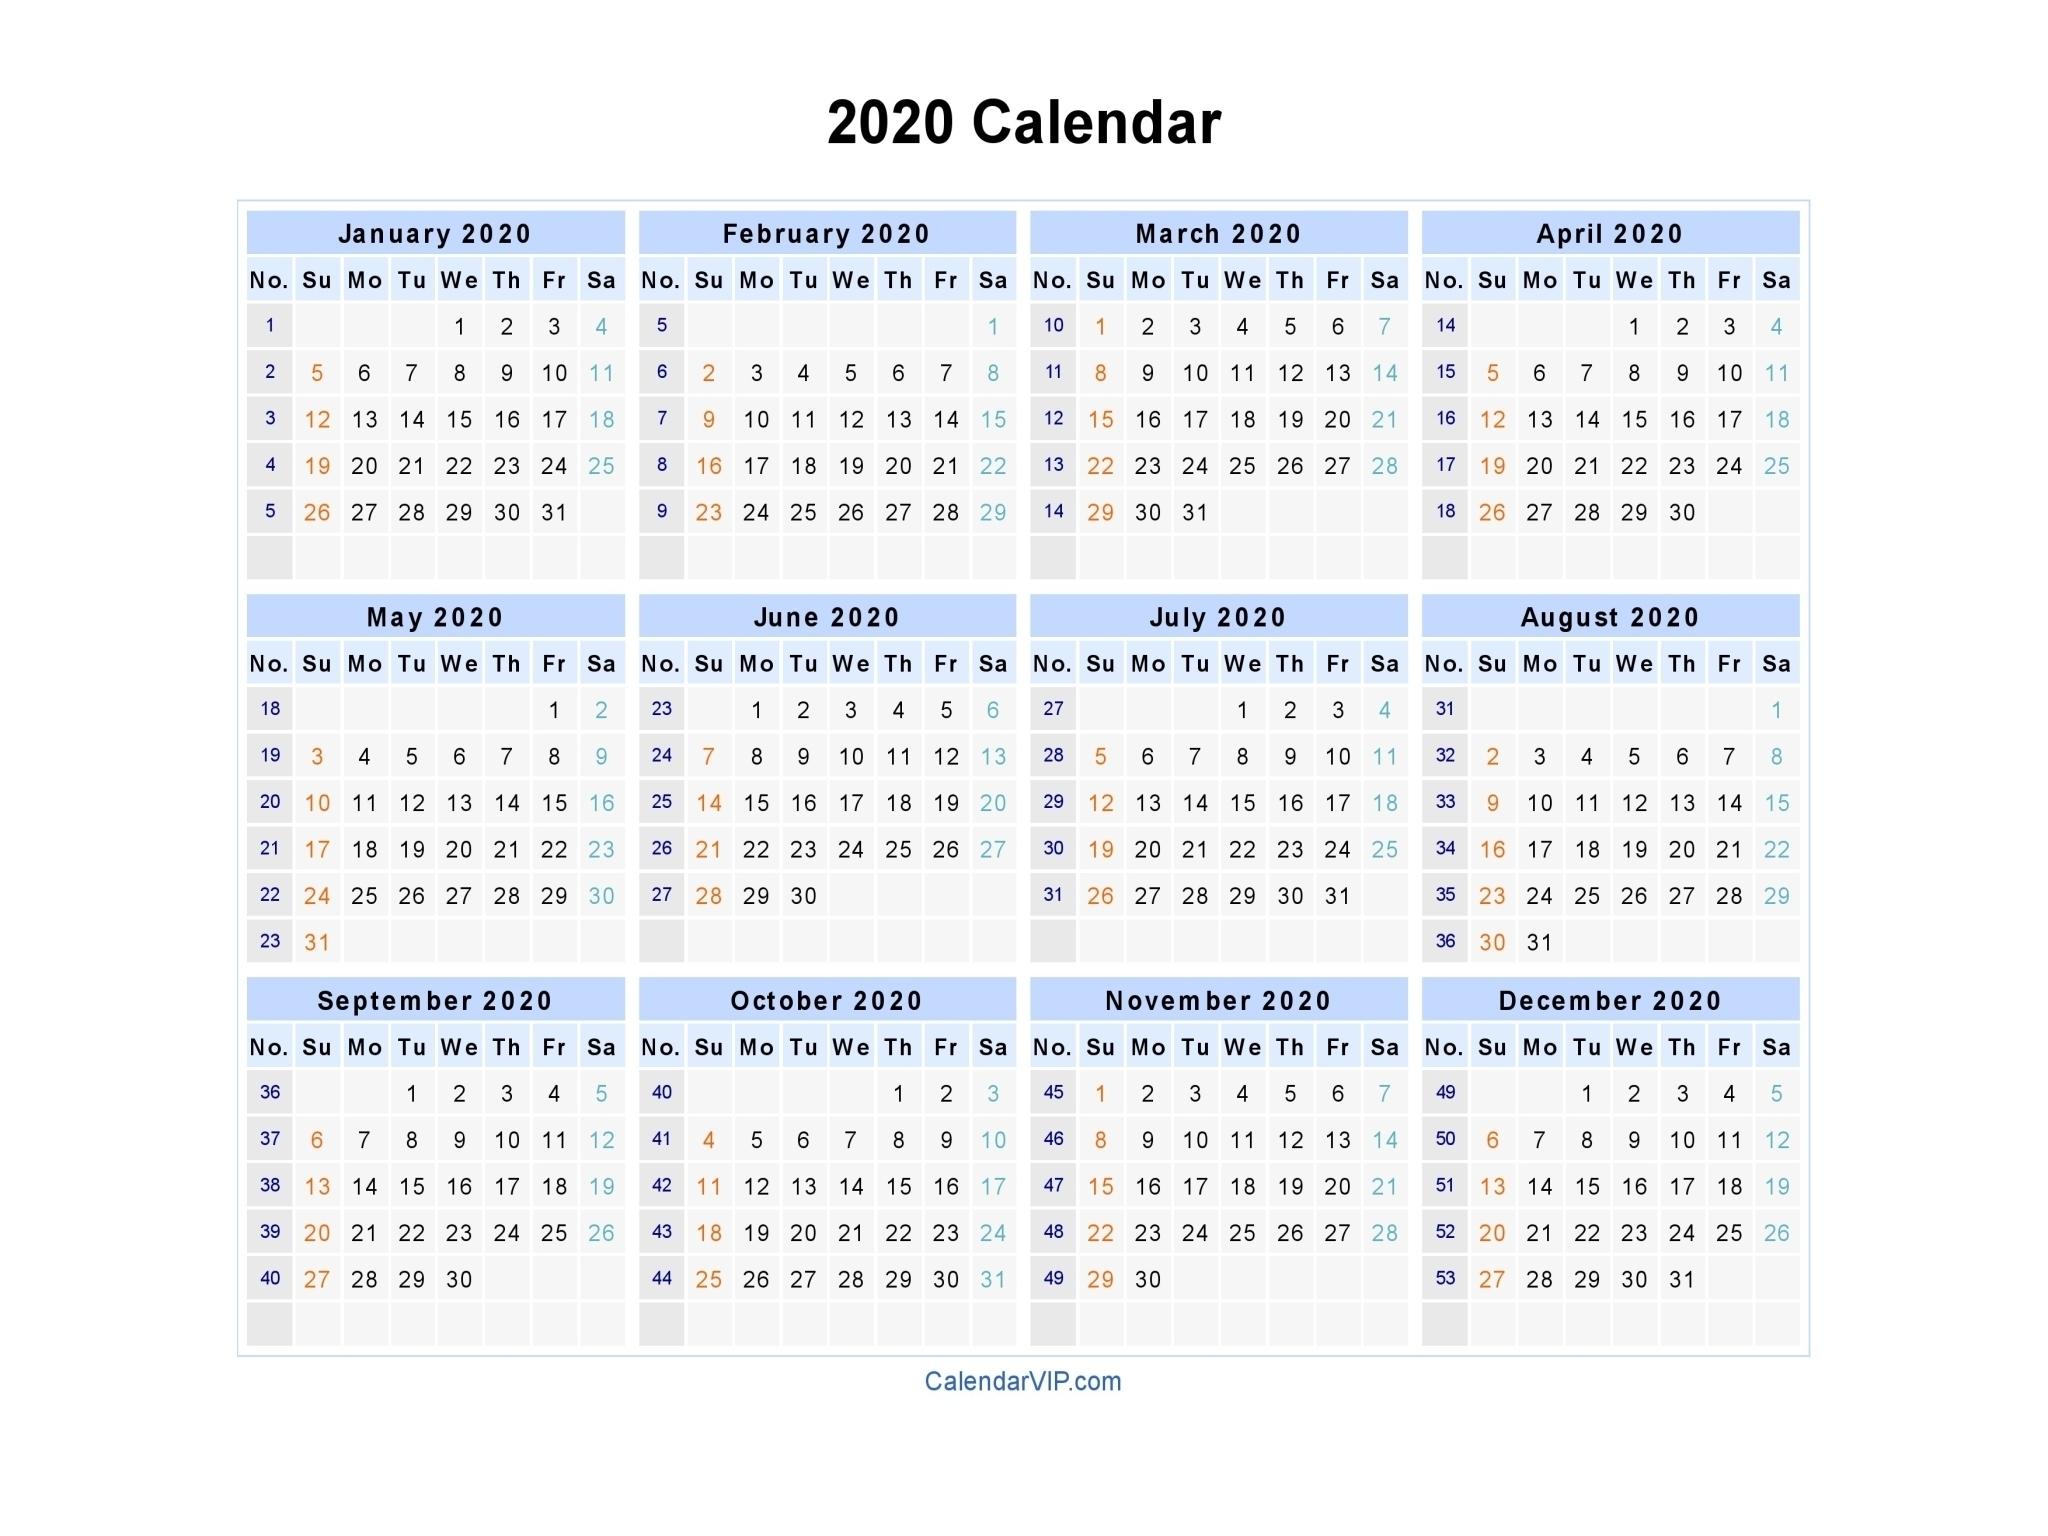 2020 Calendar – Blank Printable Calendar Template In Pdf